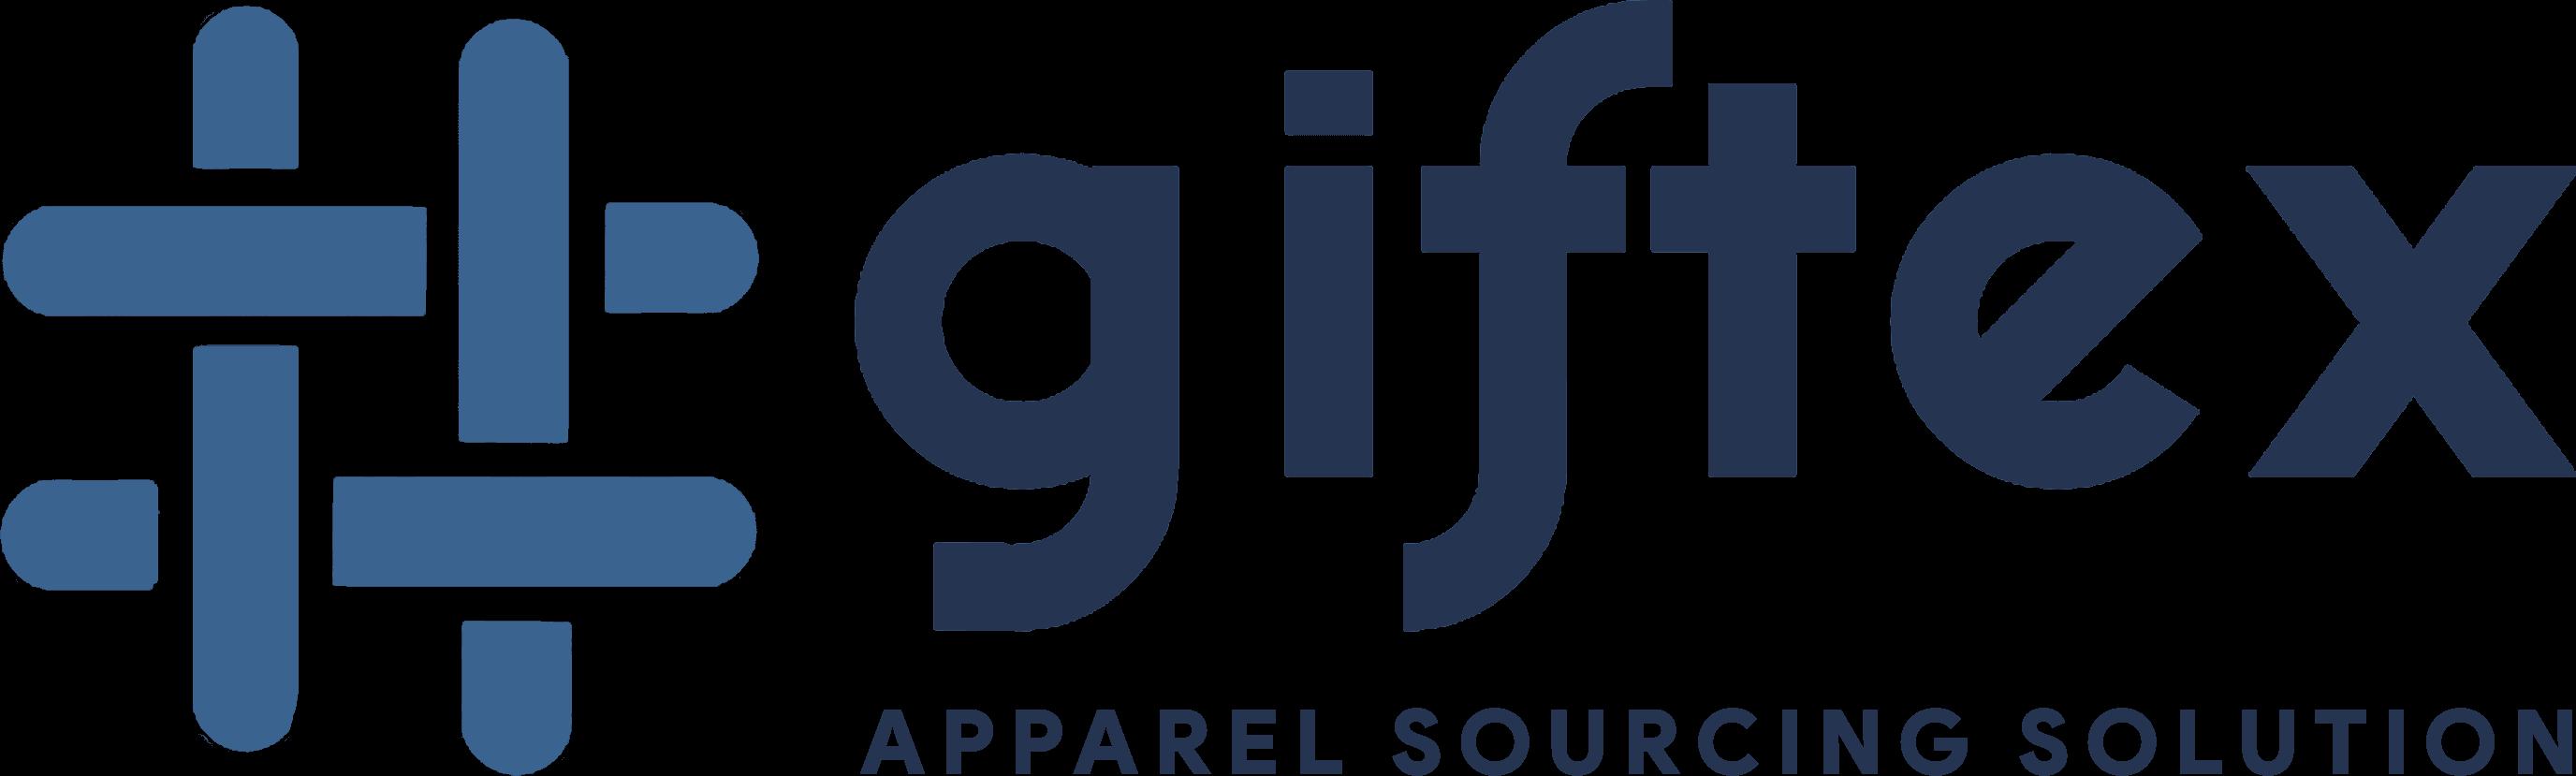 Giftex Logo